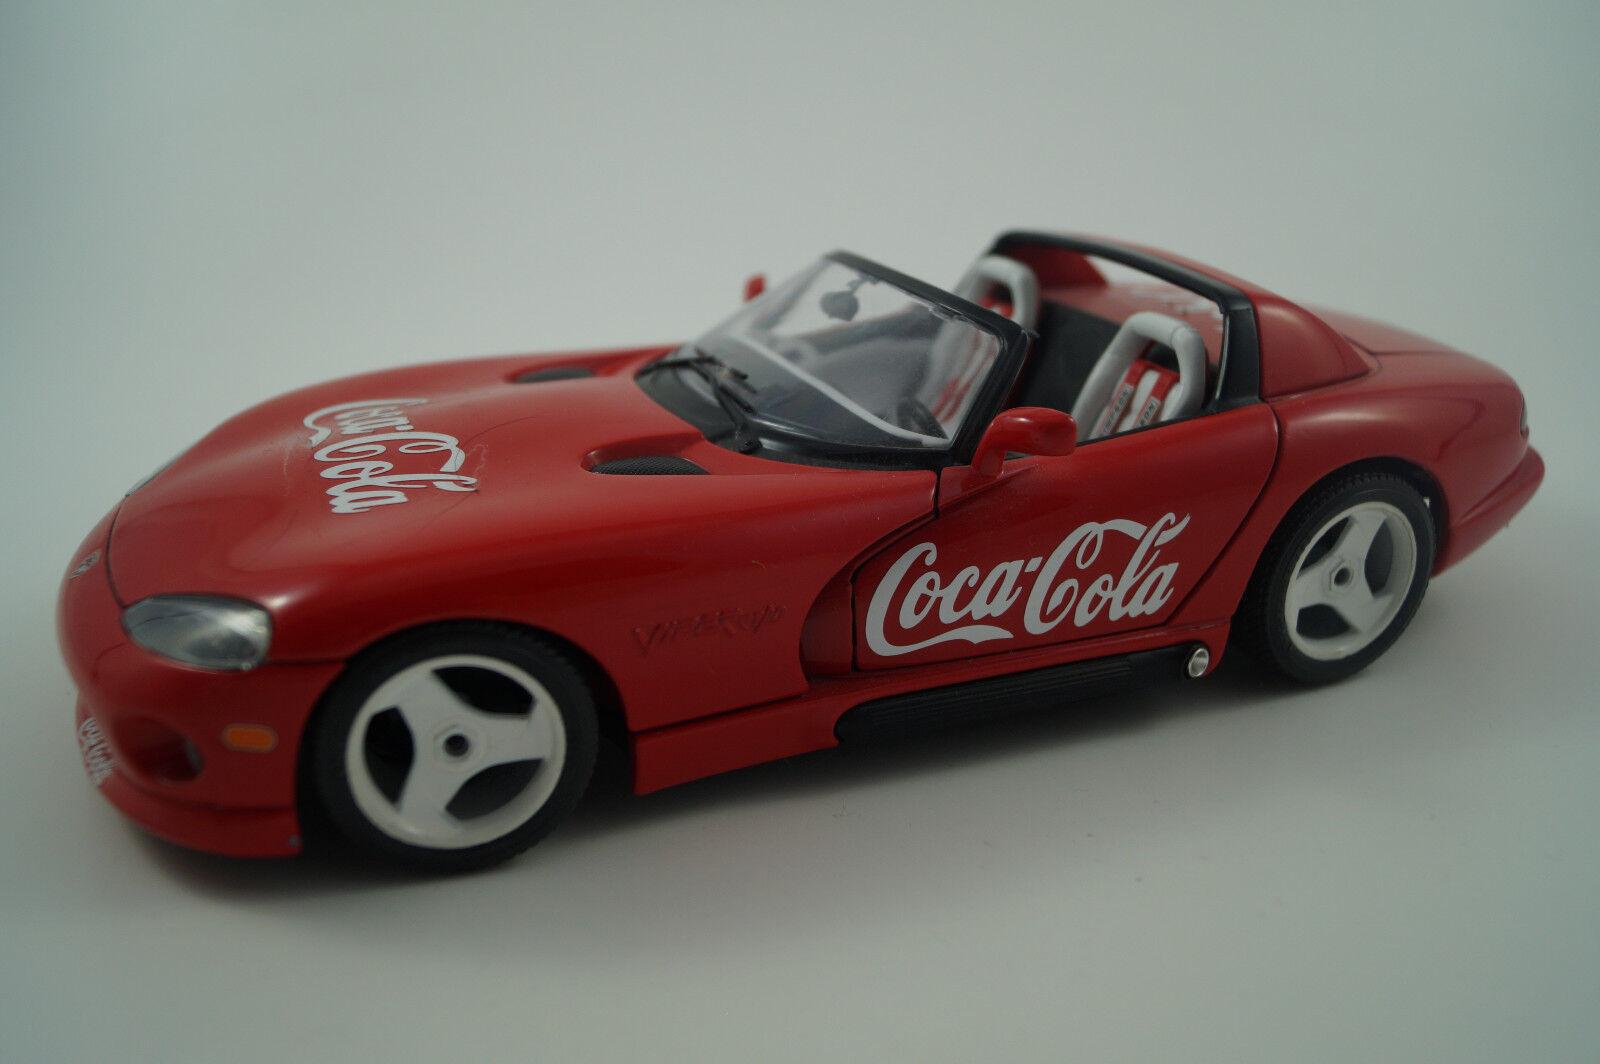 BBURAGO BURAGO voiture miniature 1 18 Dodge VIPER rt 10 Coca Cola